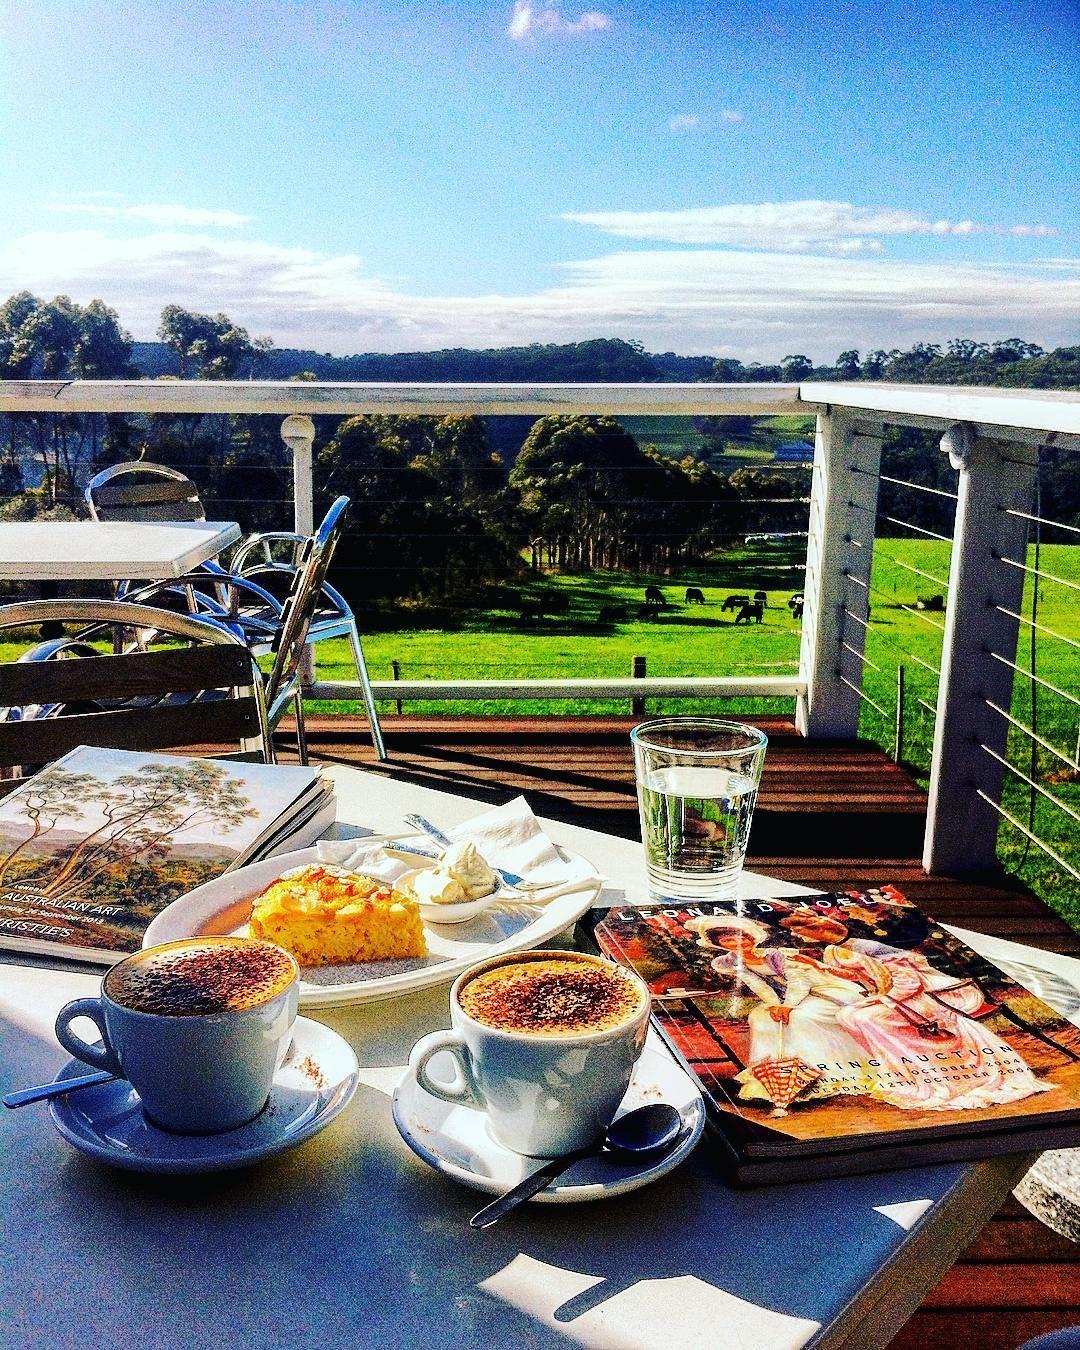 Sunday coffee..#redhill#aussieland#victoria#melbournecoffee#coffeeart#coffeeaddict#cappuccino#latteart#aussieblogger#melbourneblogger#picoftheday#traveler#visitmelbourne#visitvictoria#aussie#joannaofmelbourne by joanna_of_melbourne